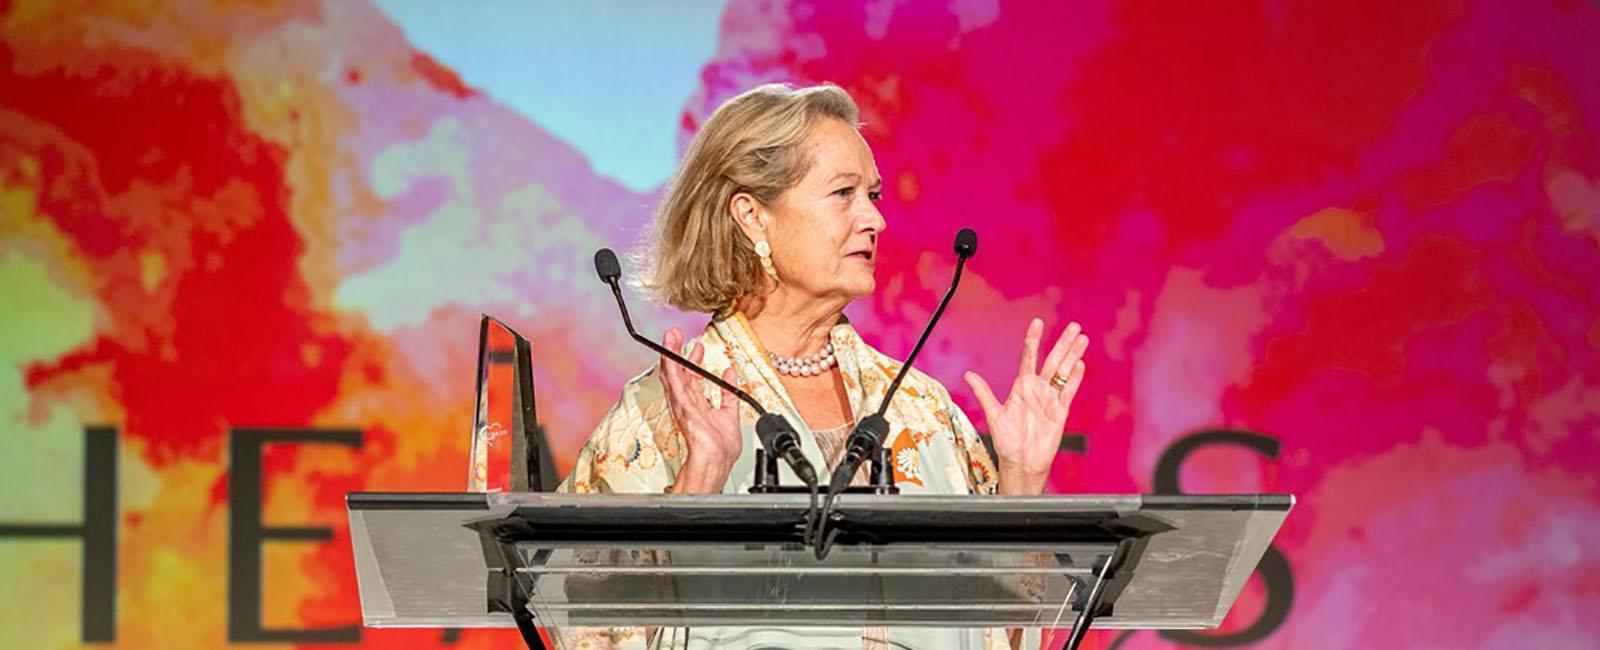 Caroline Hipple accepted the HEARTS Award